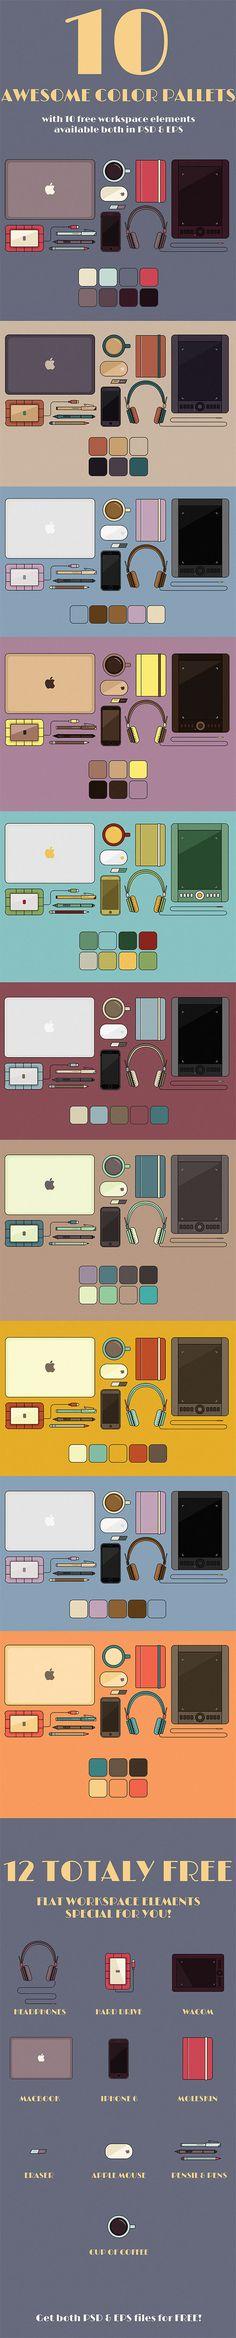 FREE 10 Flat Workspace Elements & Color Palettes on Behance